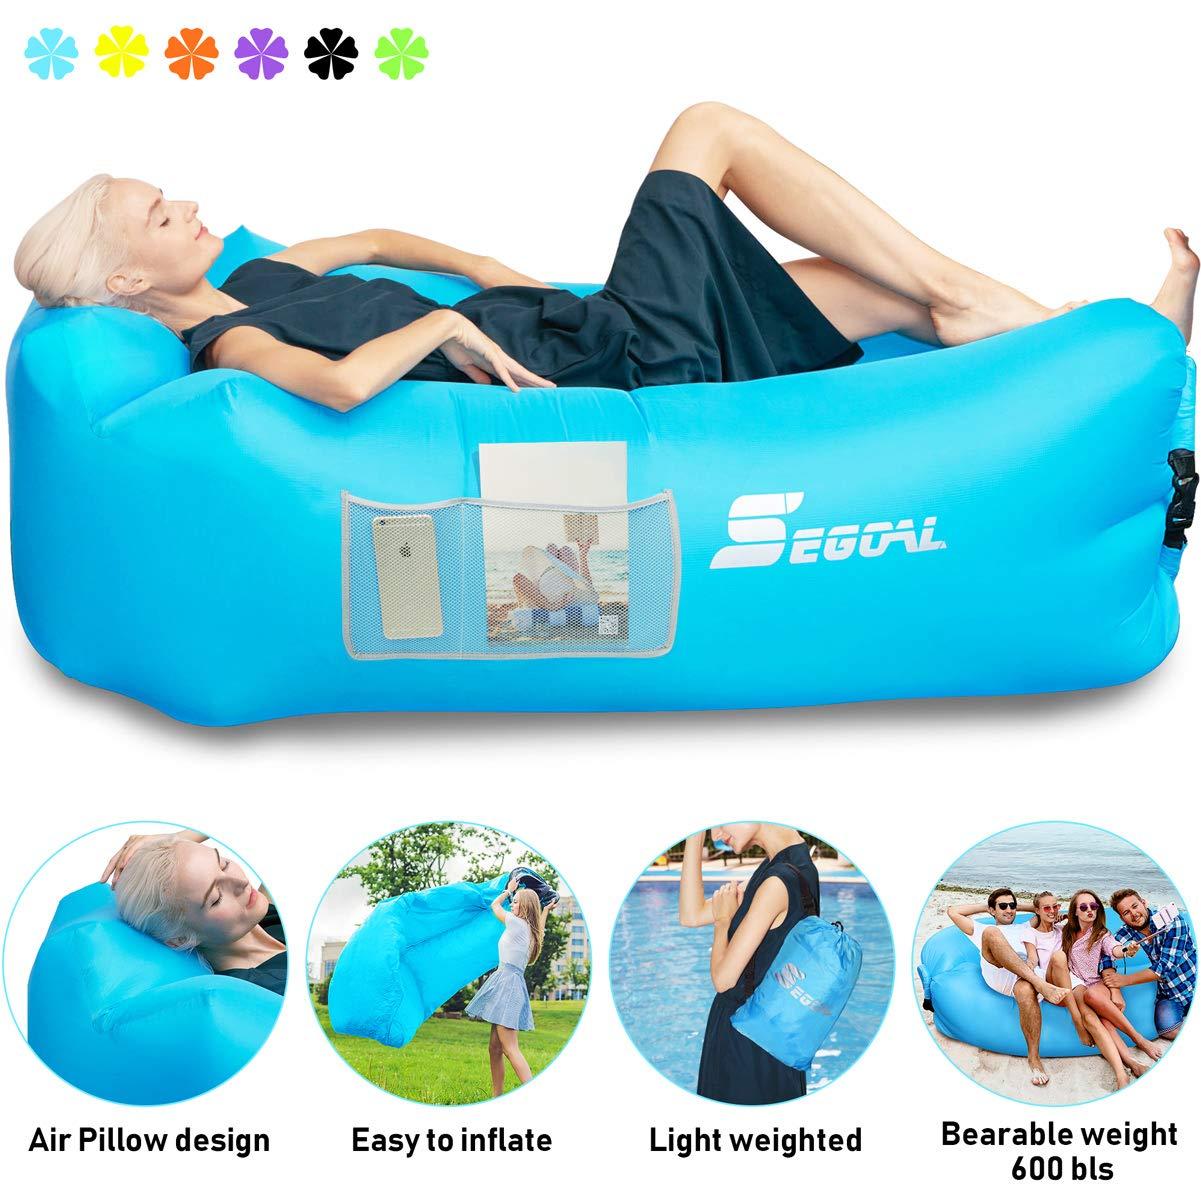 SEGOAL Inflatable Portable Anti Air Leaking